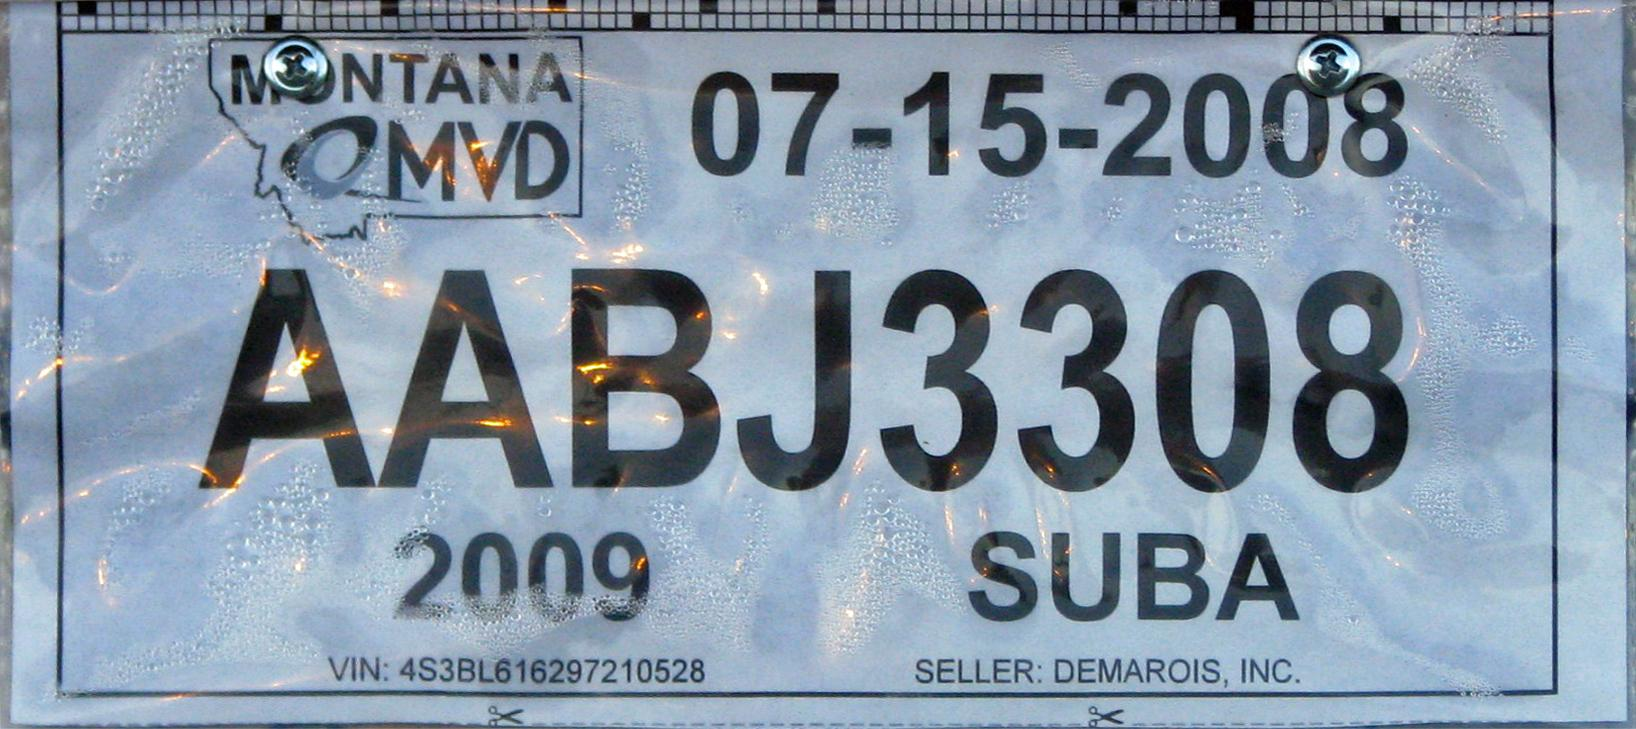 License Plate 9751